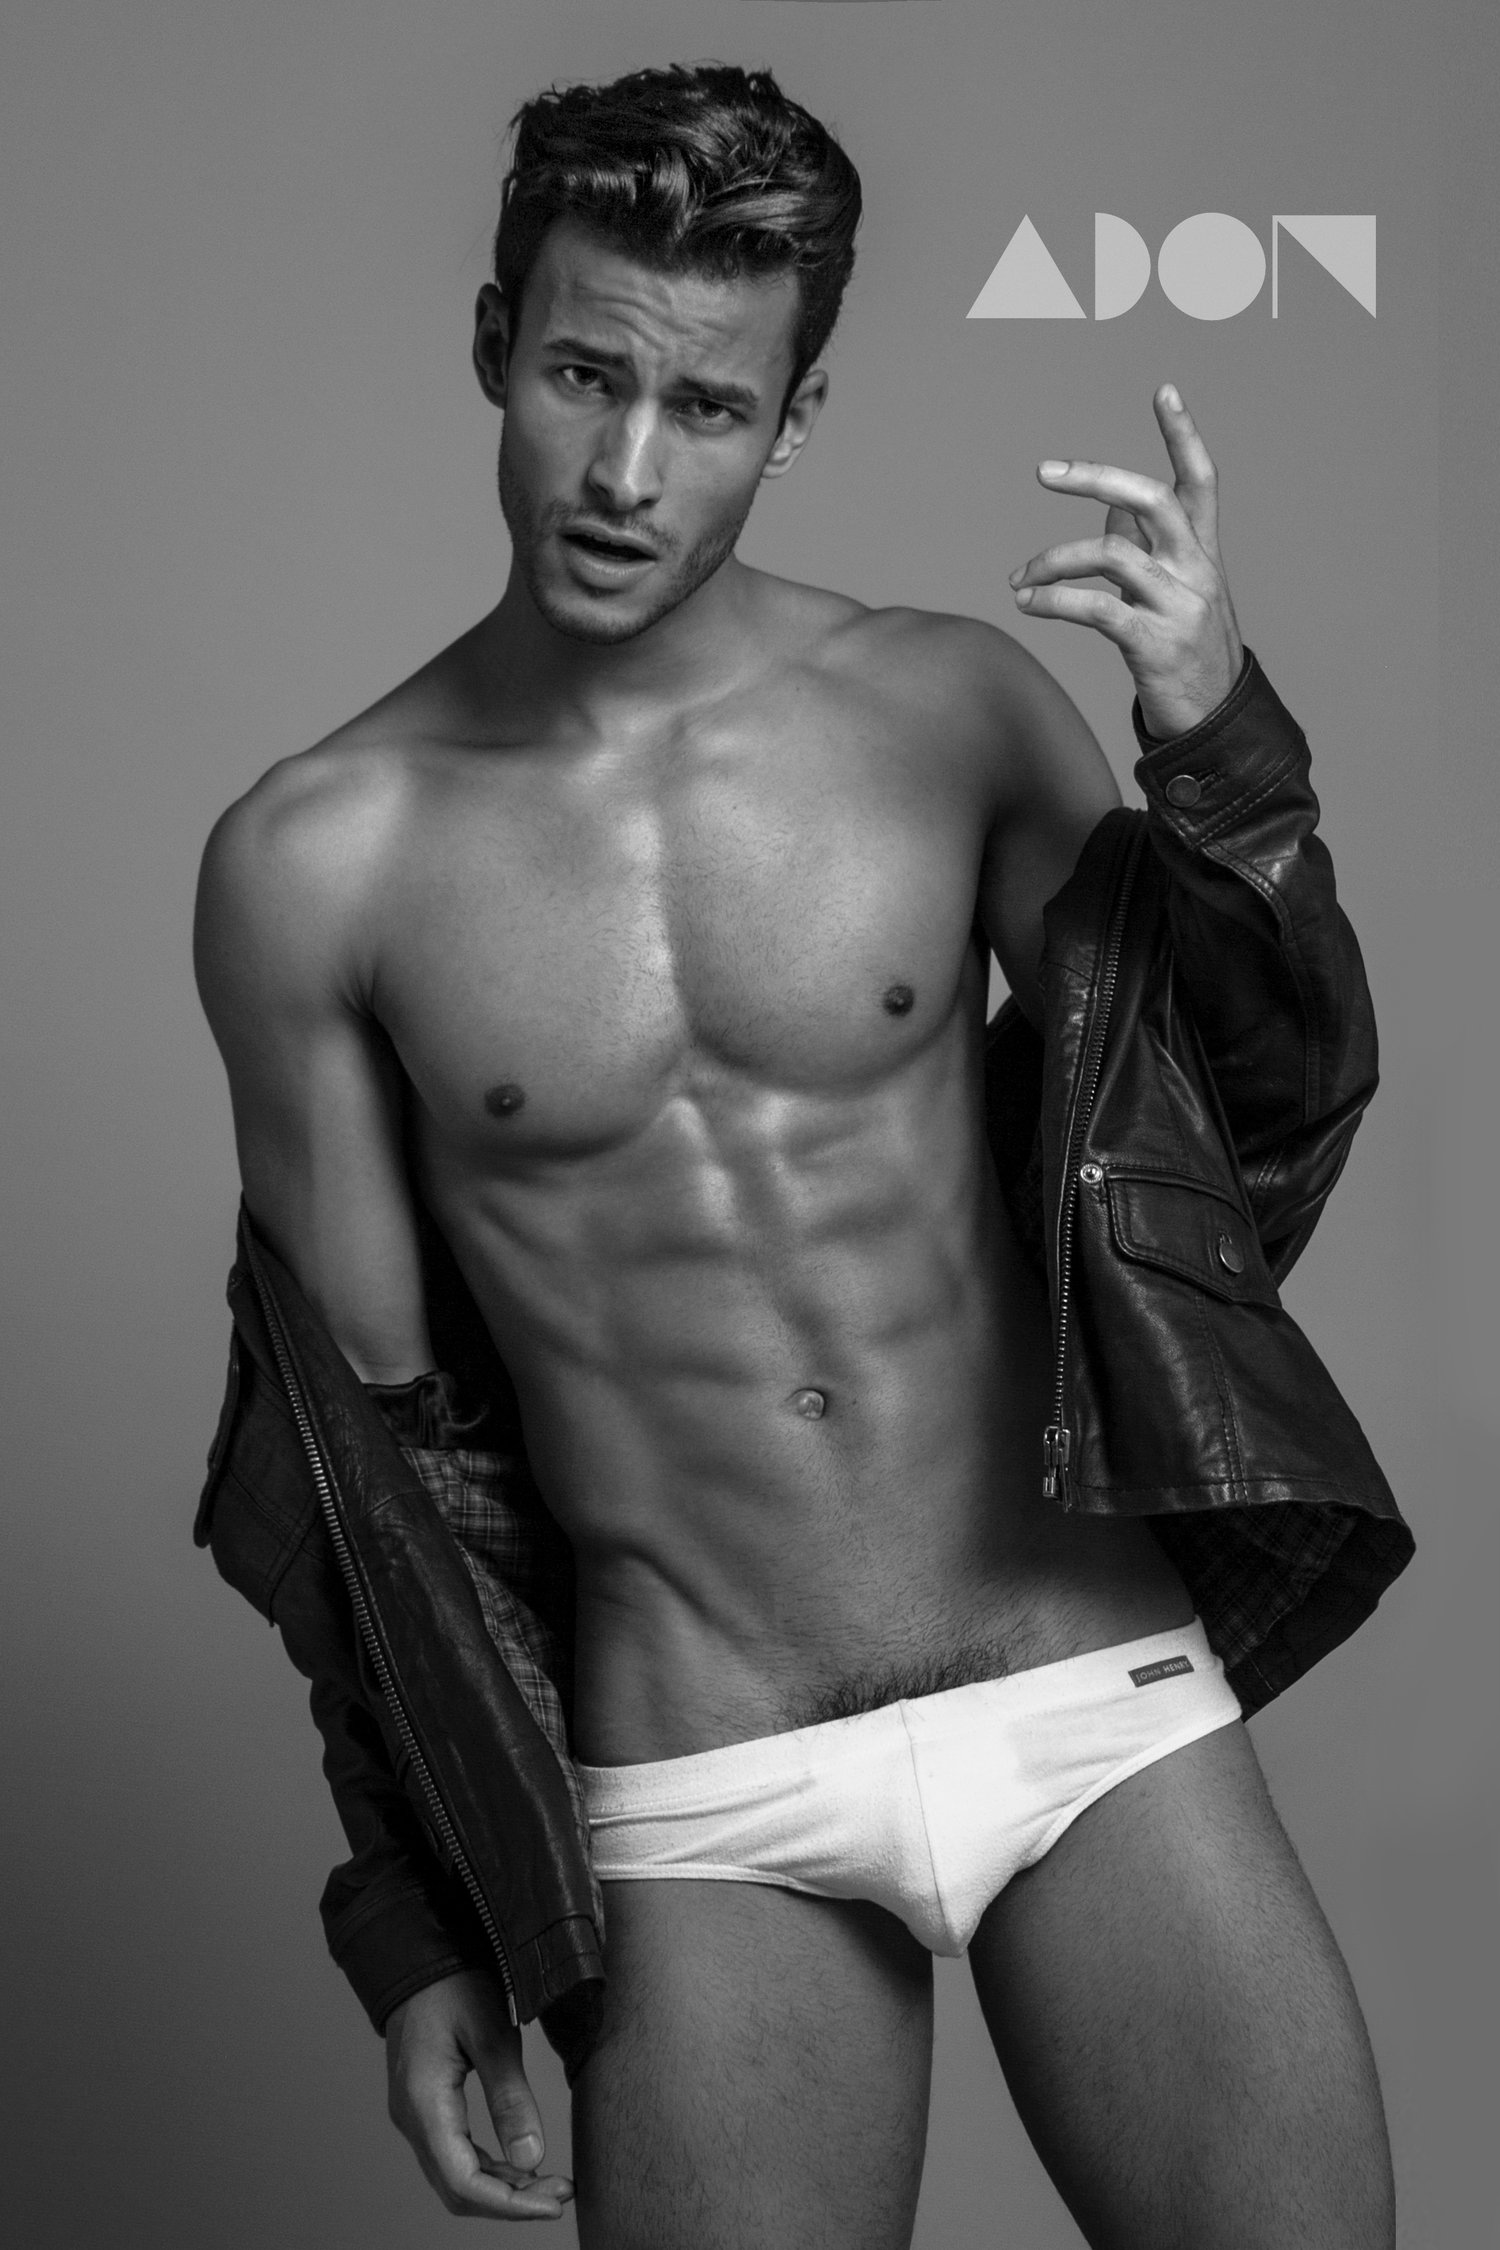 Adon Exclusive: Model Renato Freitas By Sandy Lang